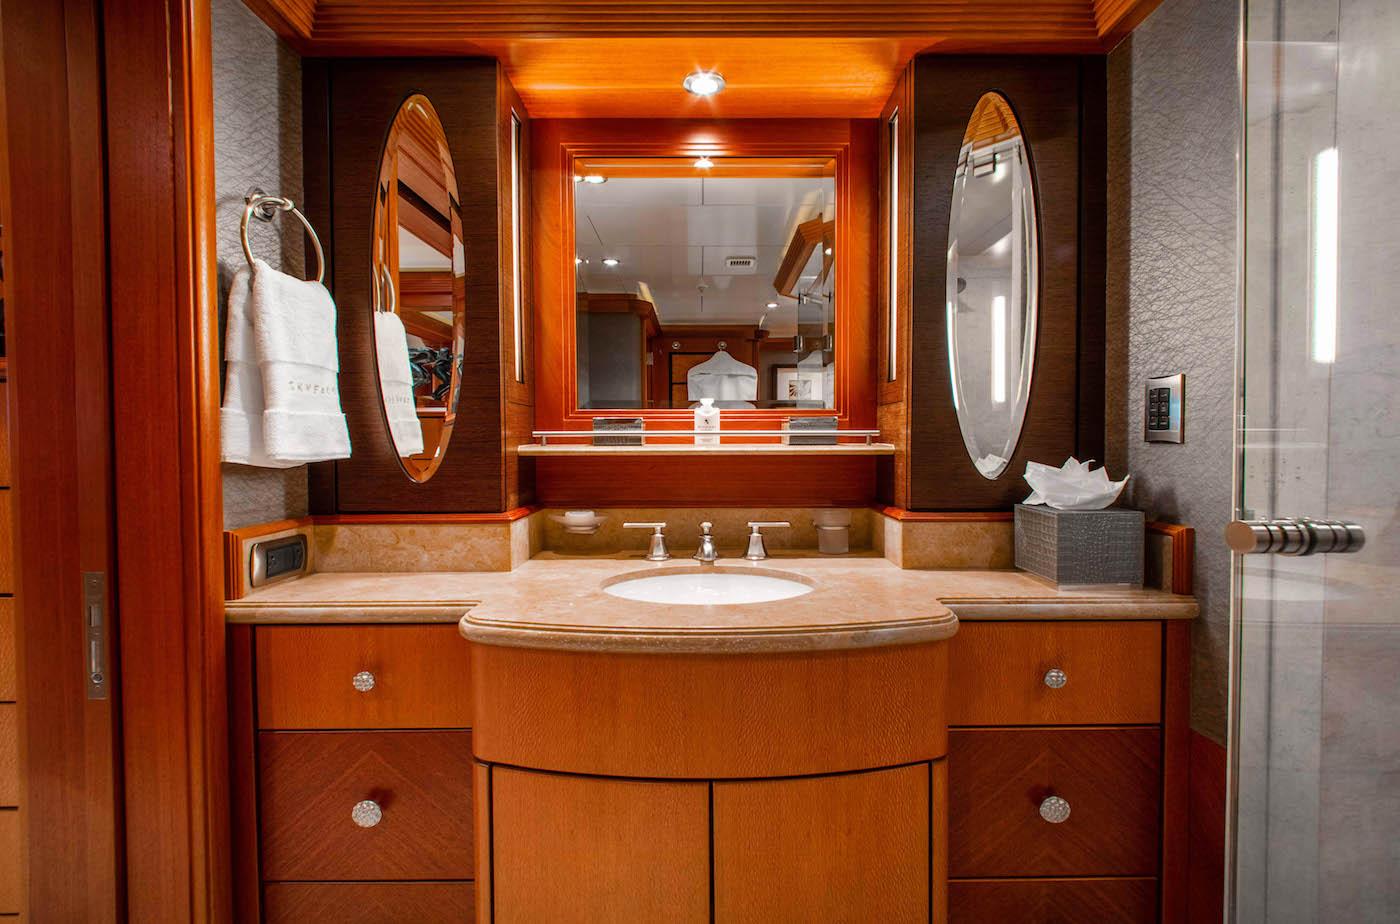 Full- Beam VIP - Sink In The Bathroom